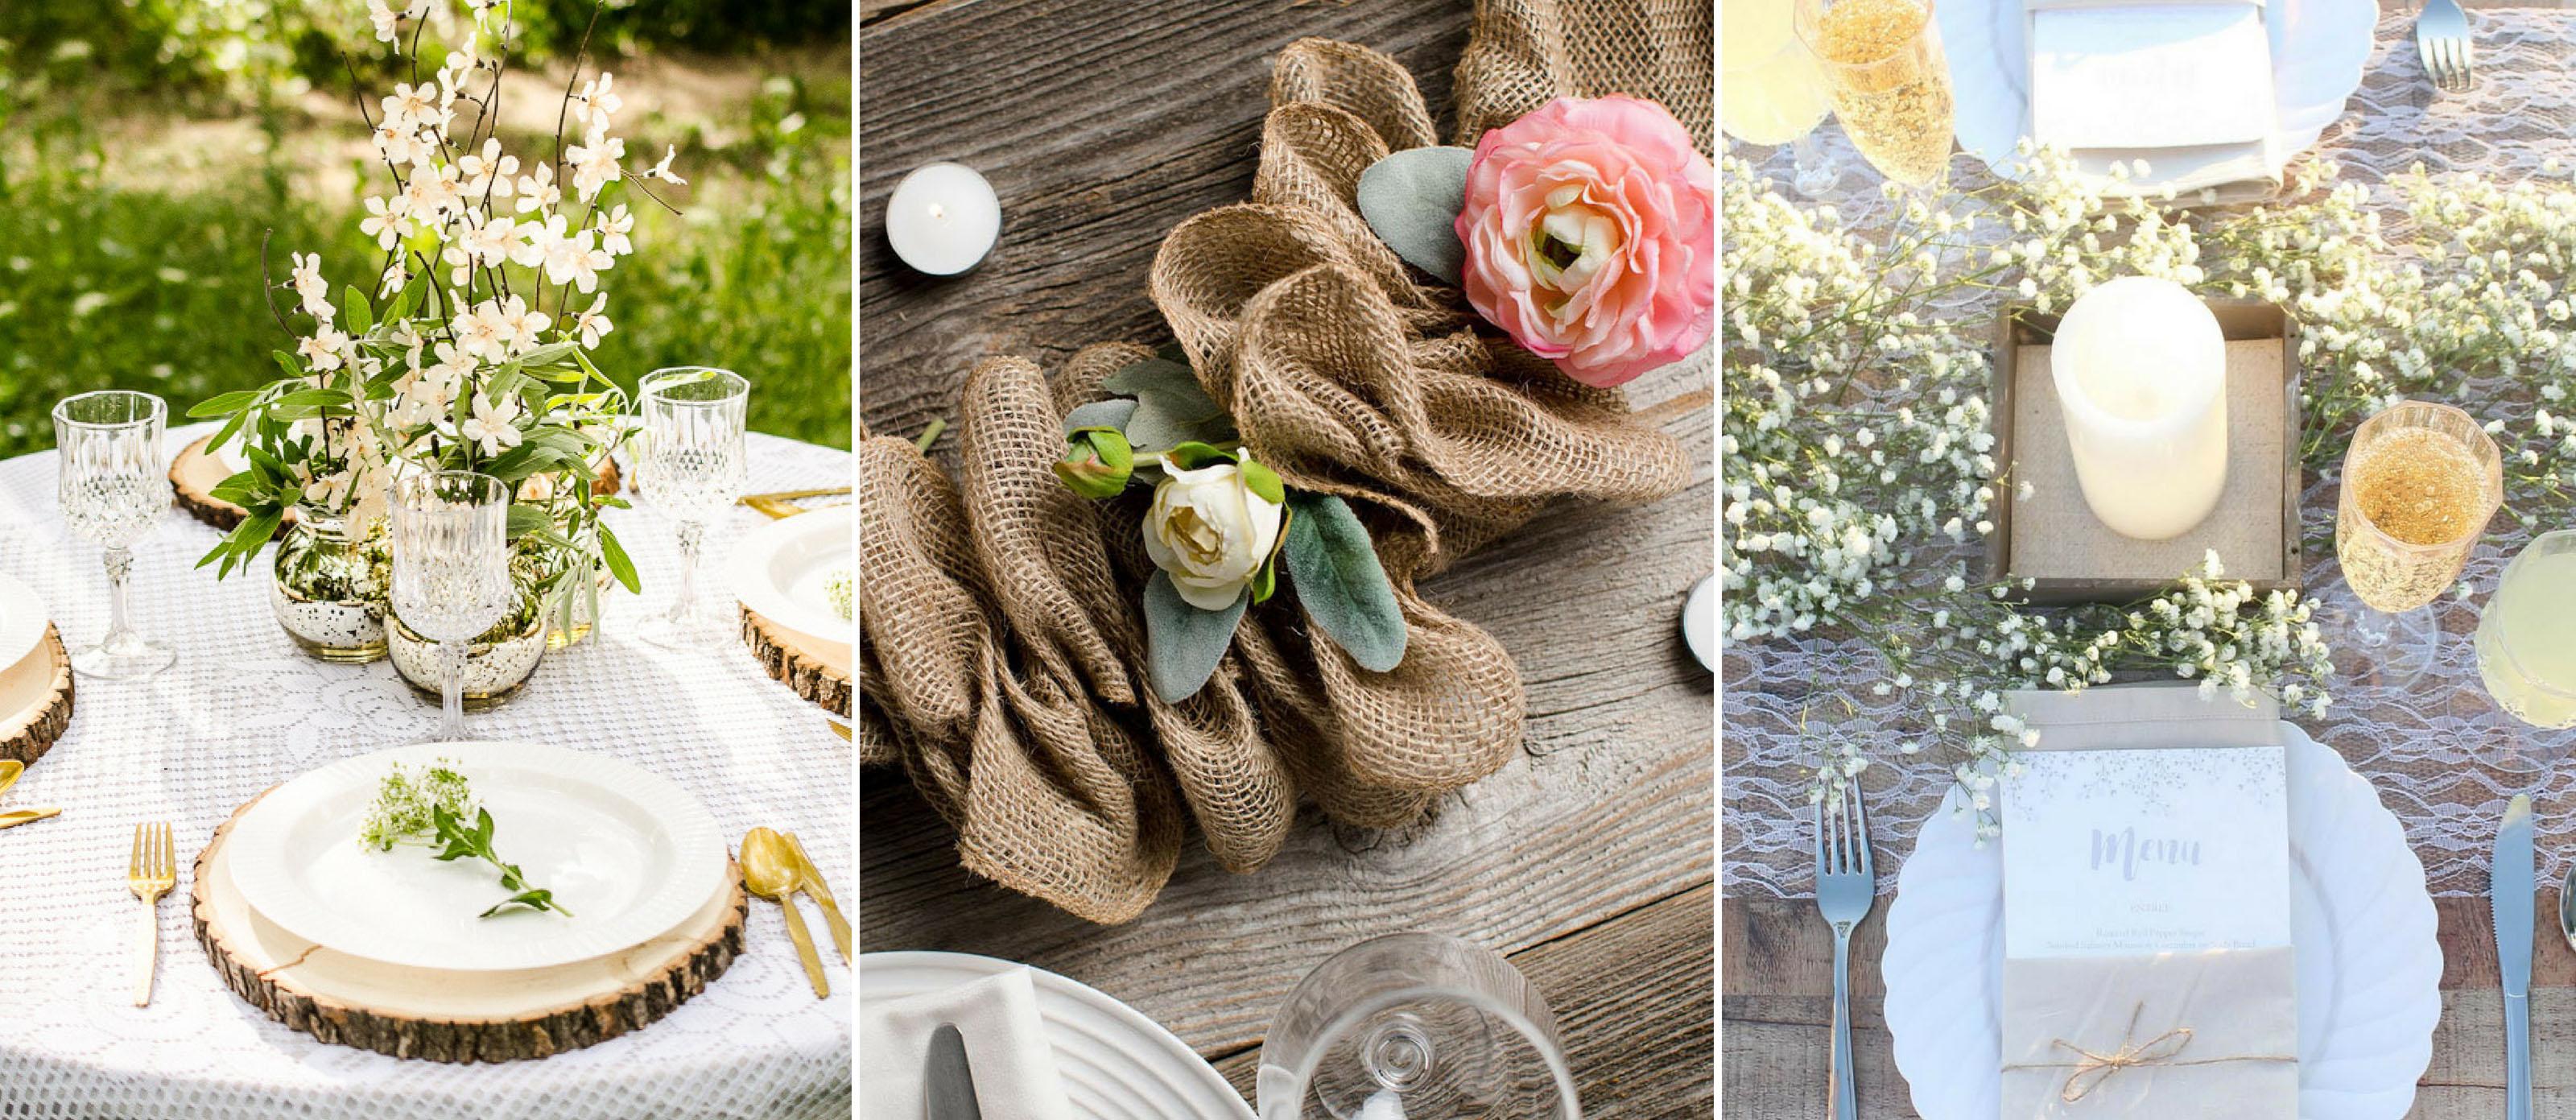 14 Gorgeous Rustic Wedding Decor Ideas Fun365